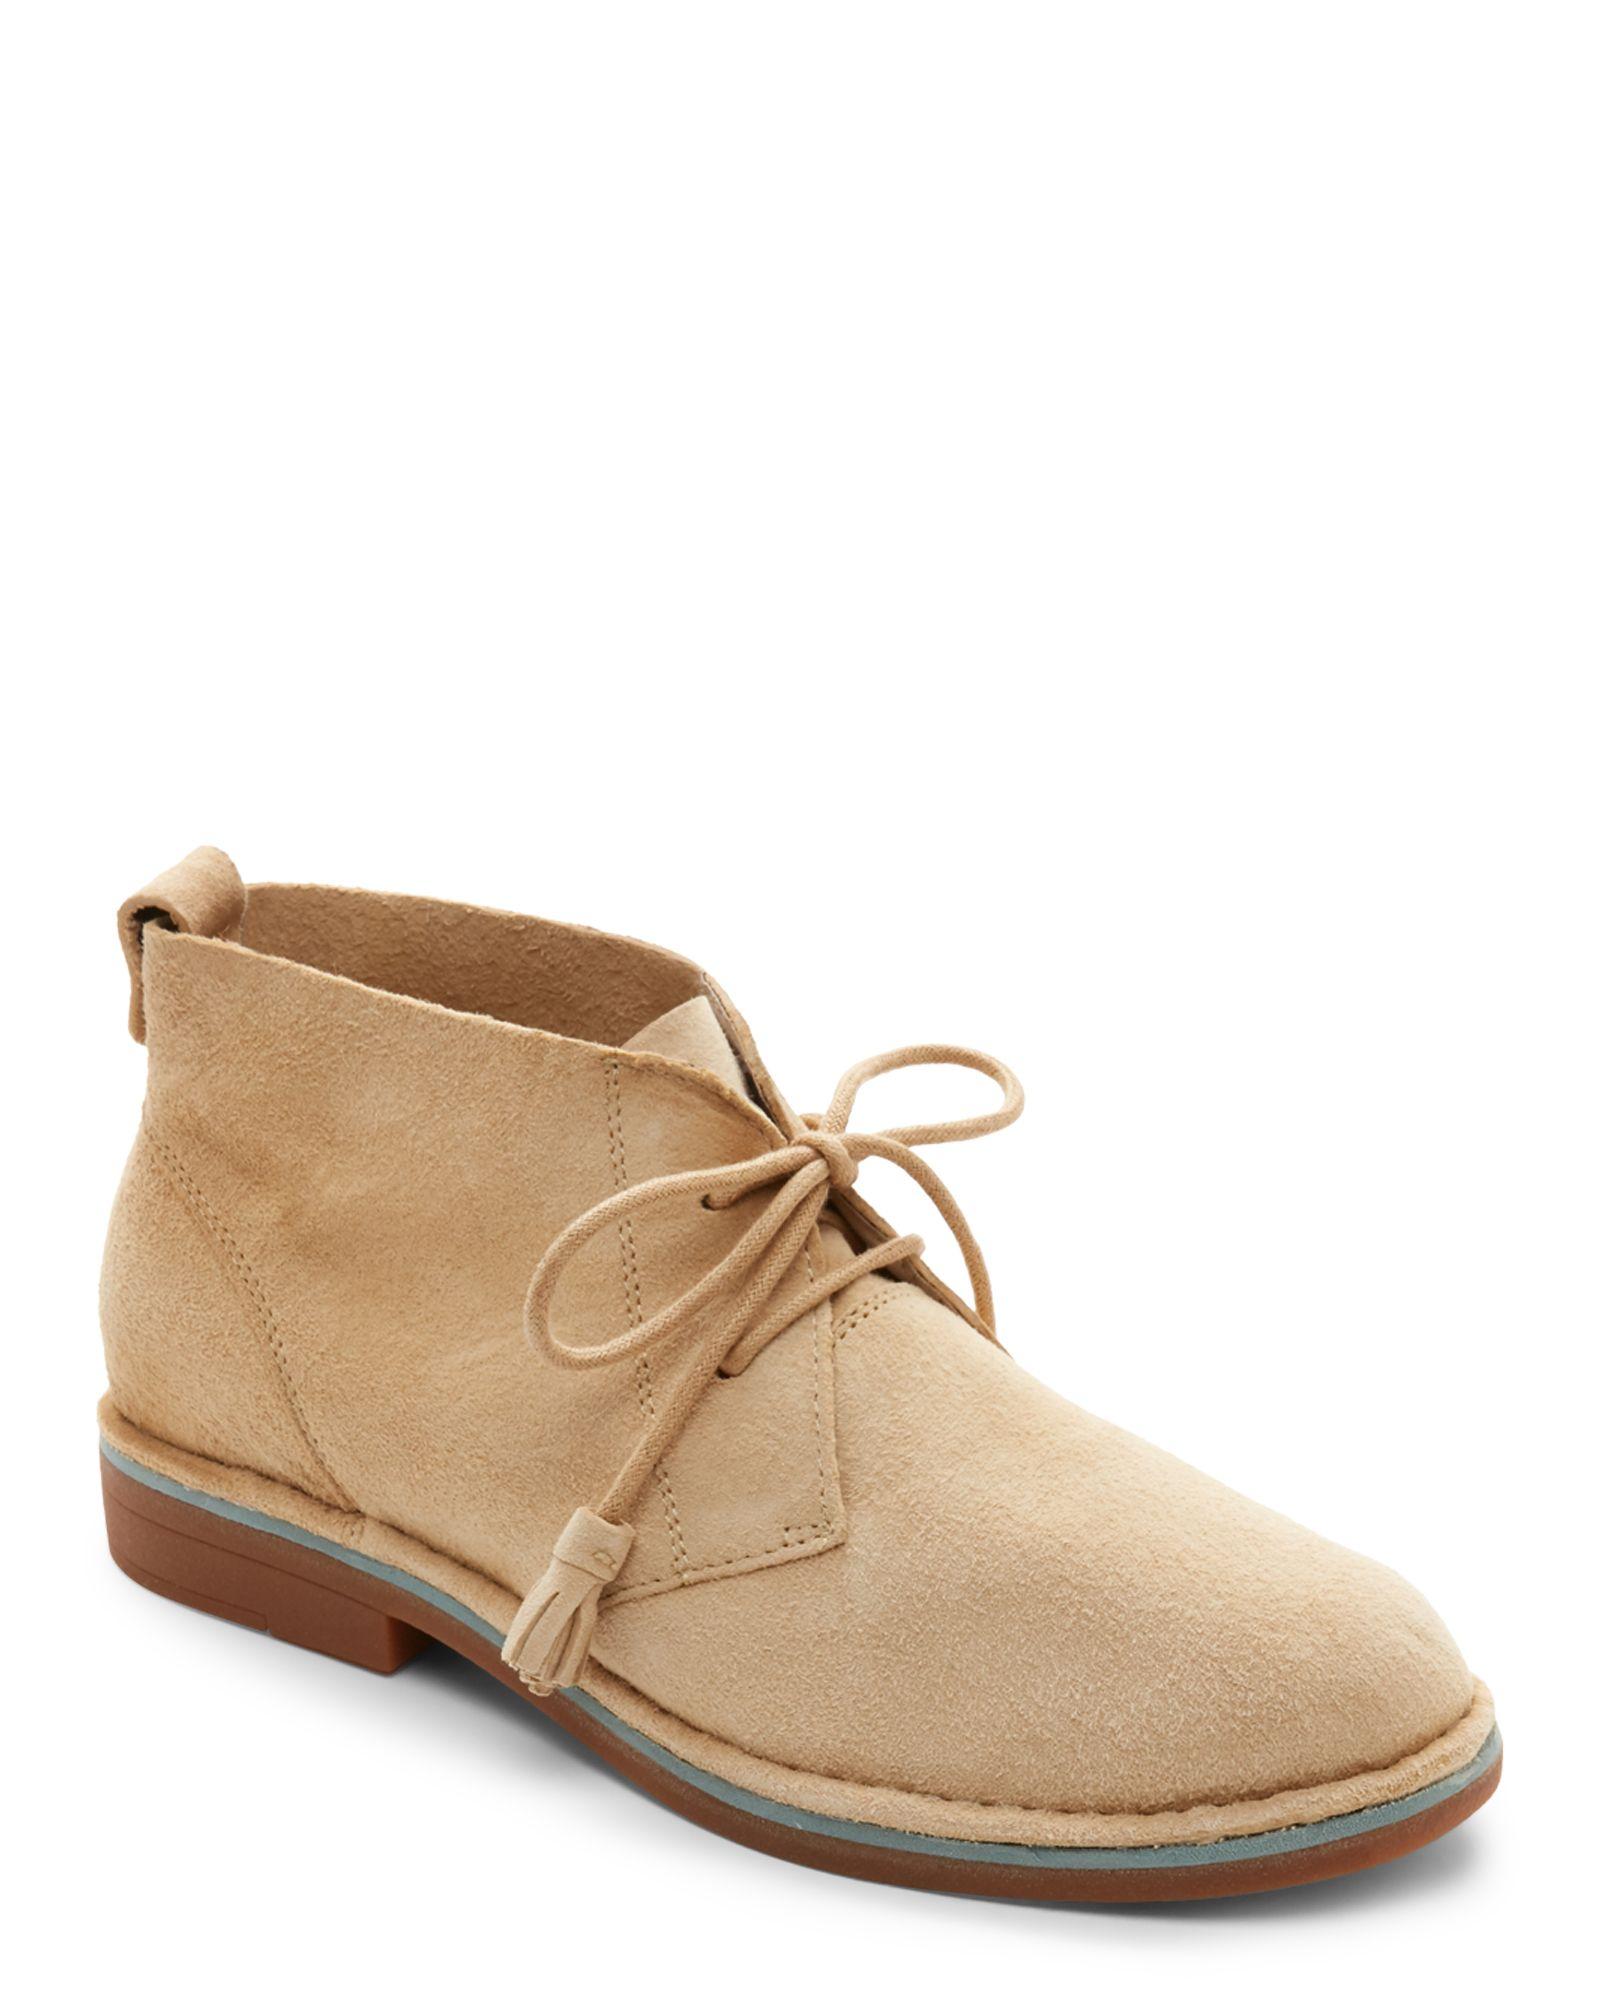 Hush Puppies Light Tan Cyra Catelyn Wide Chukka Boots